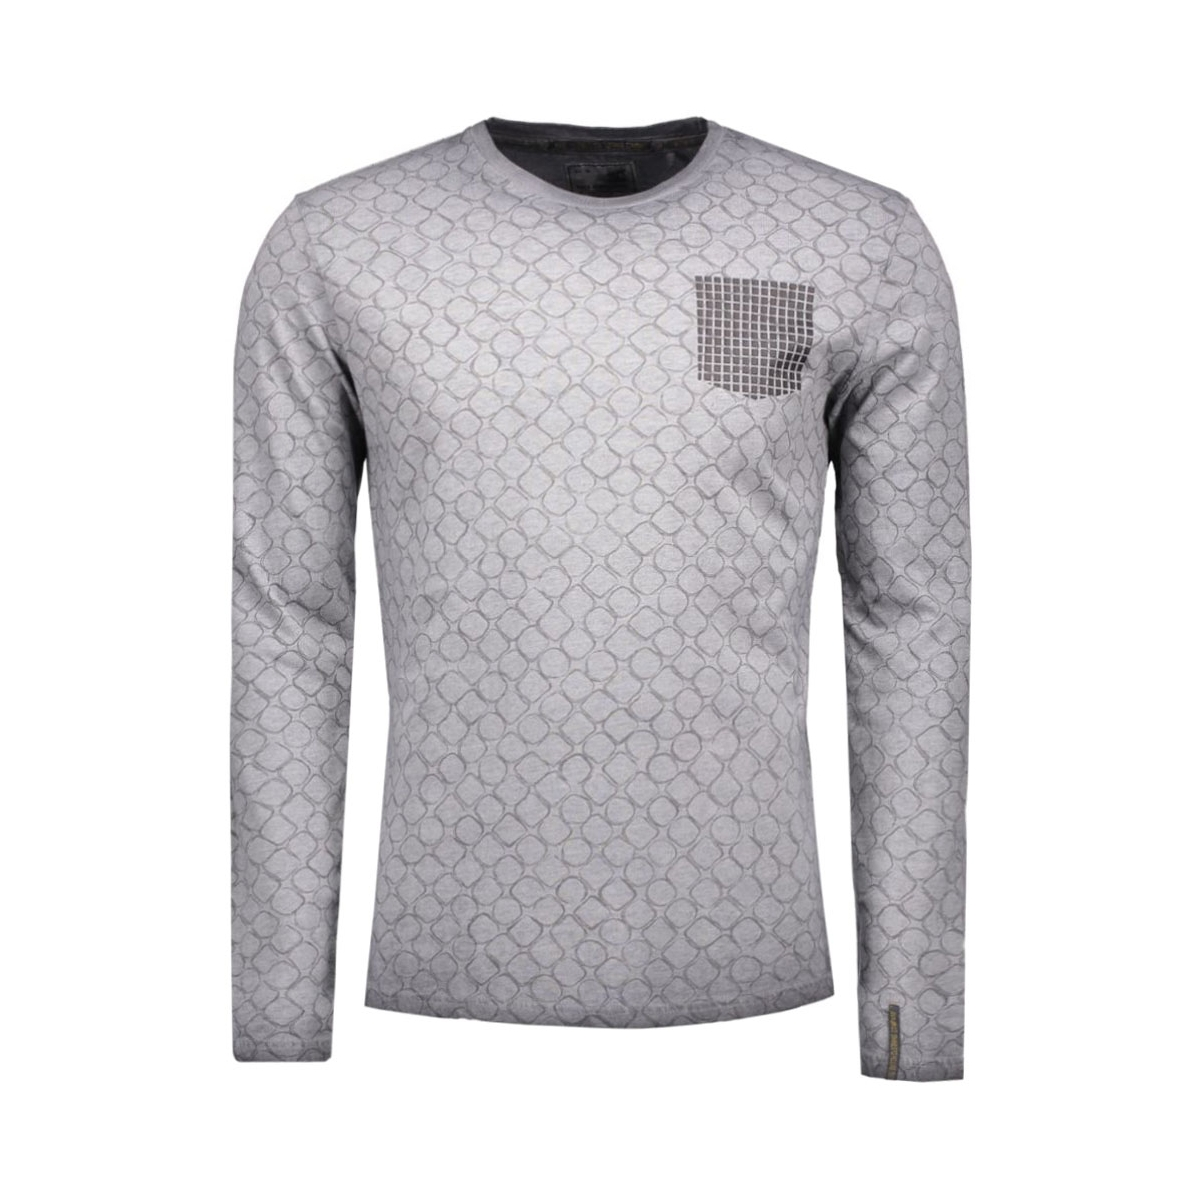 78120701 no-excess t-shirt 023 dk grey